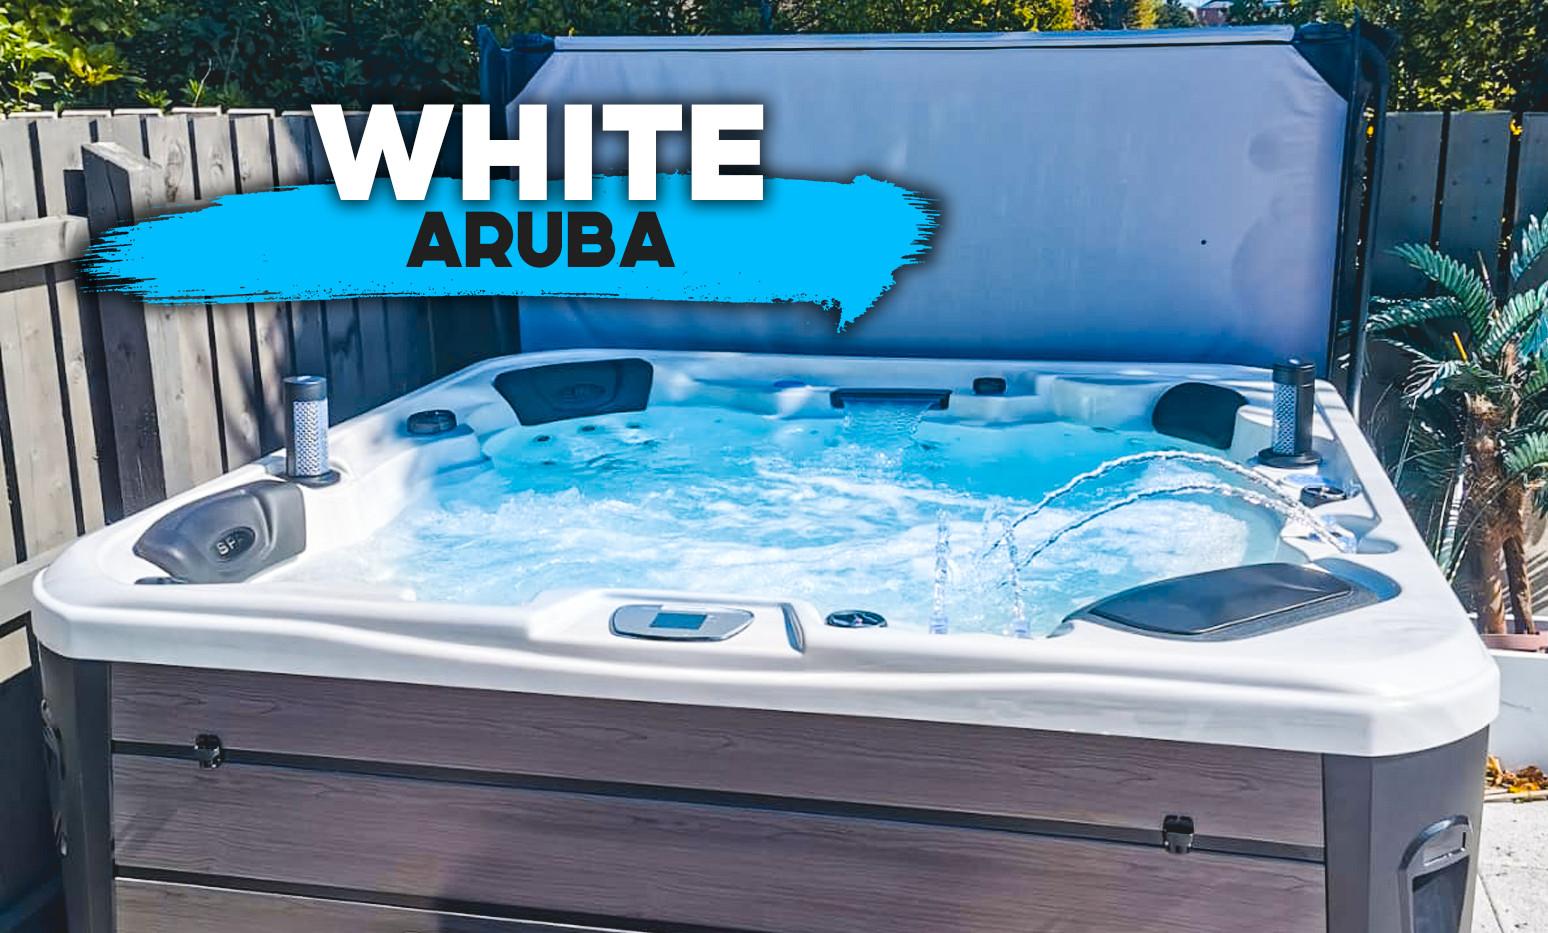 Aruba_PreviousInstall_WHITE.jpg